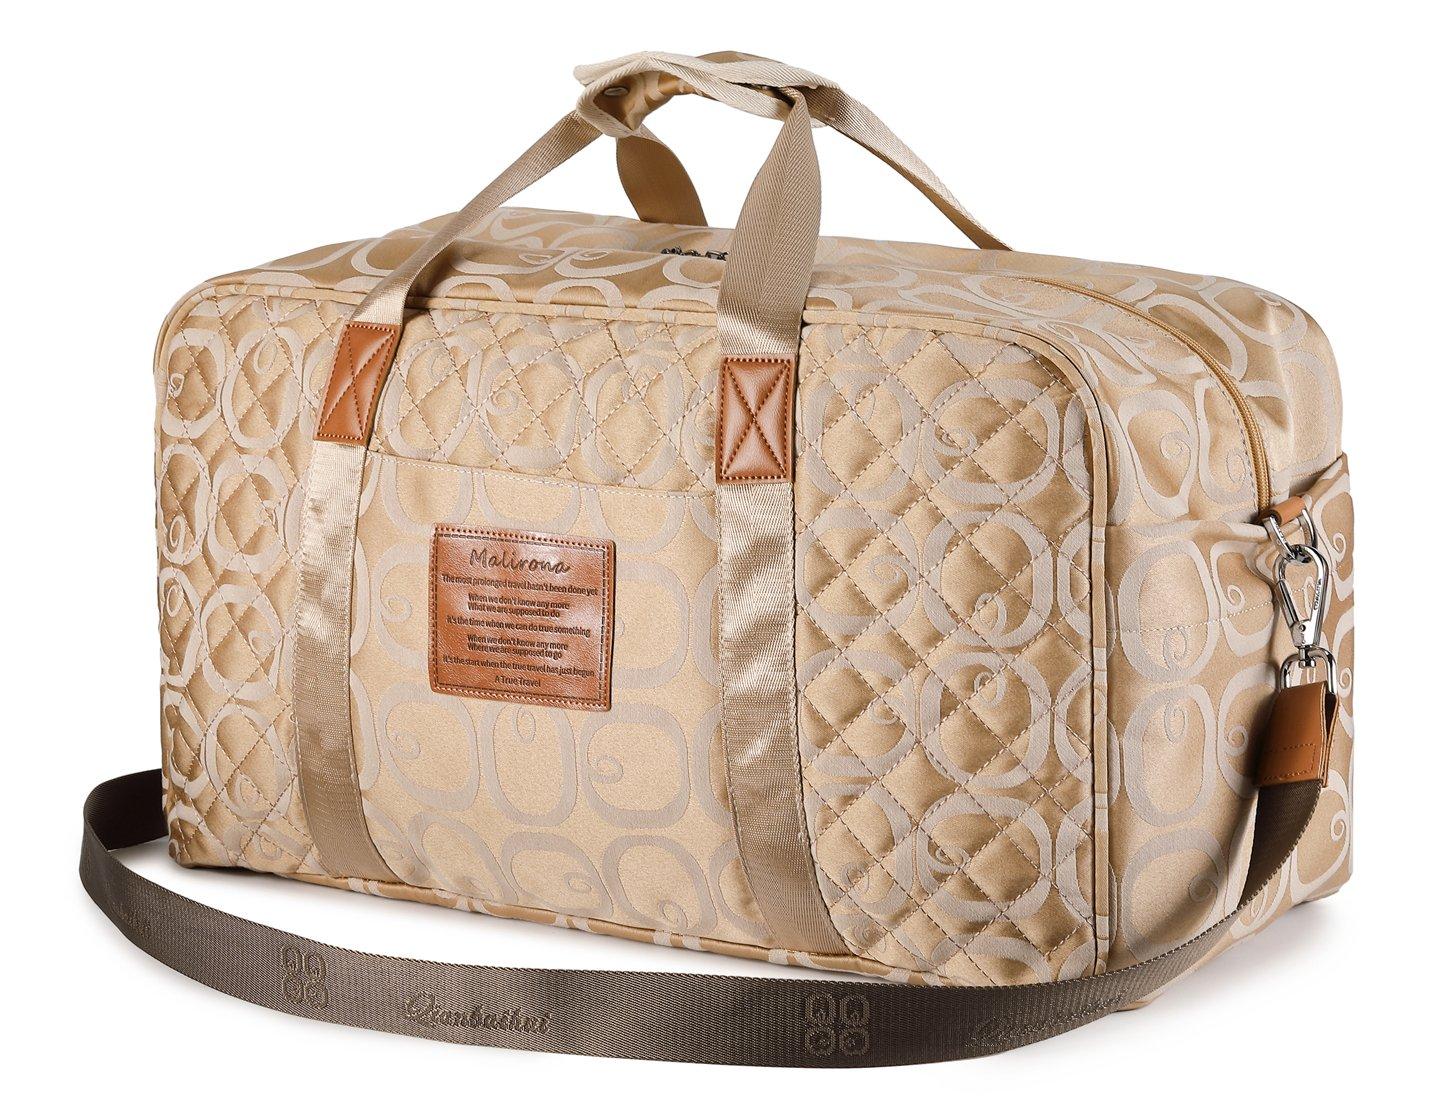 Malirona Canvas Weekender Bag Travel Duffel Bag for Weekend Overnight Trip (Seasonal Flowers Apricot)